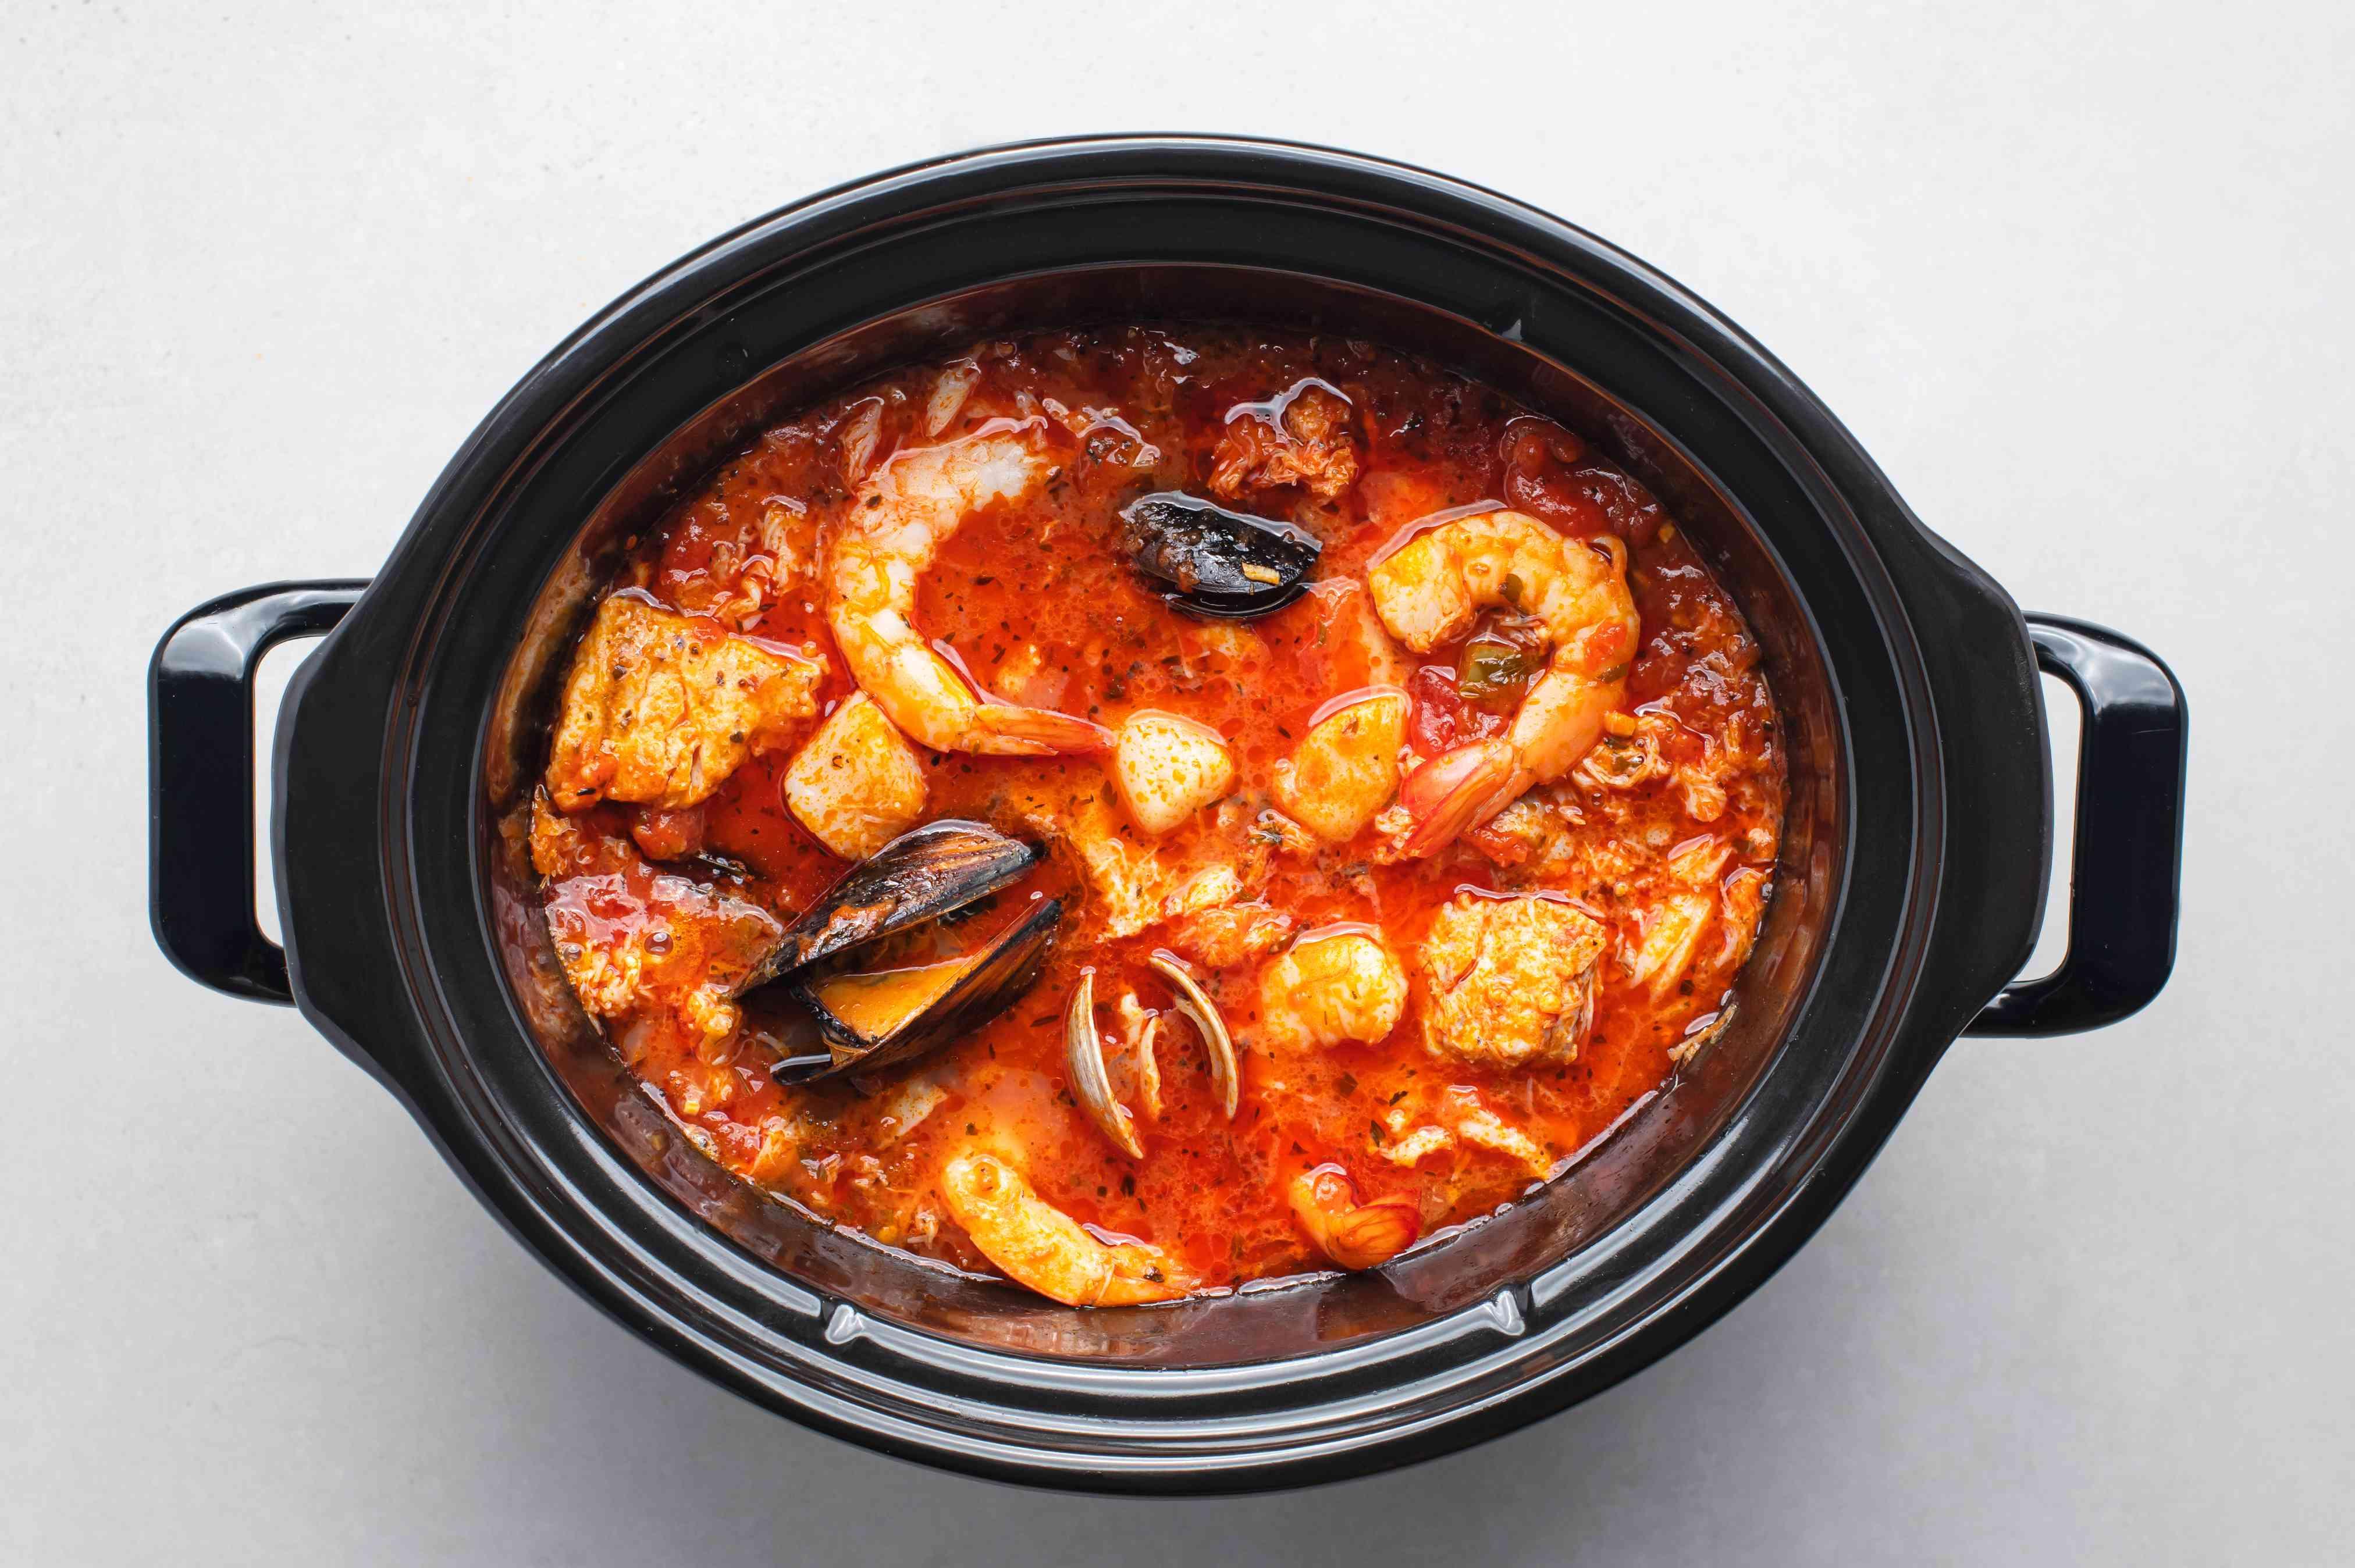 Crock Pot Fisherman's Stew (Cioppino)